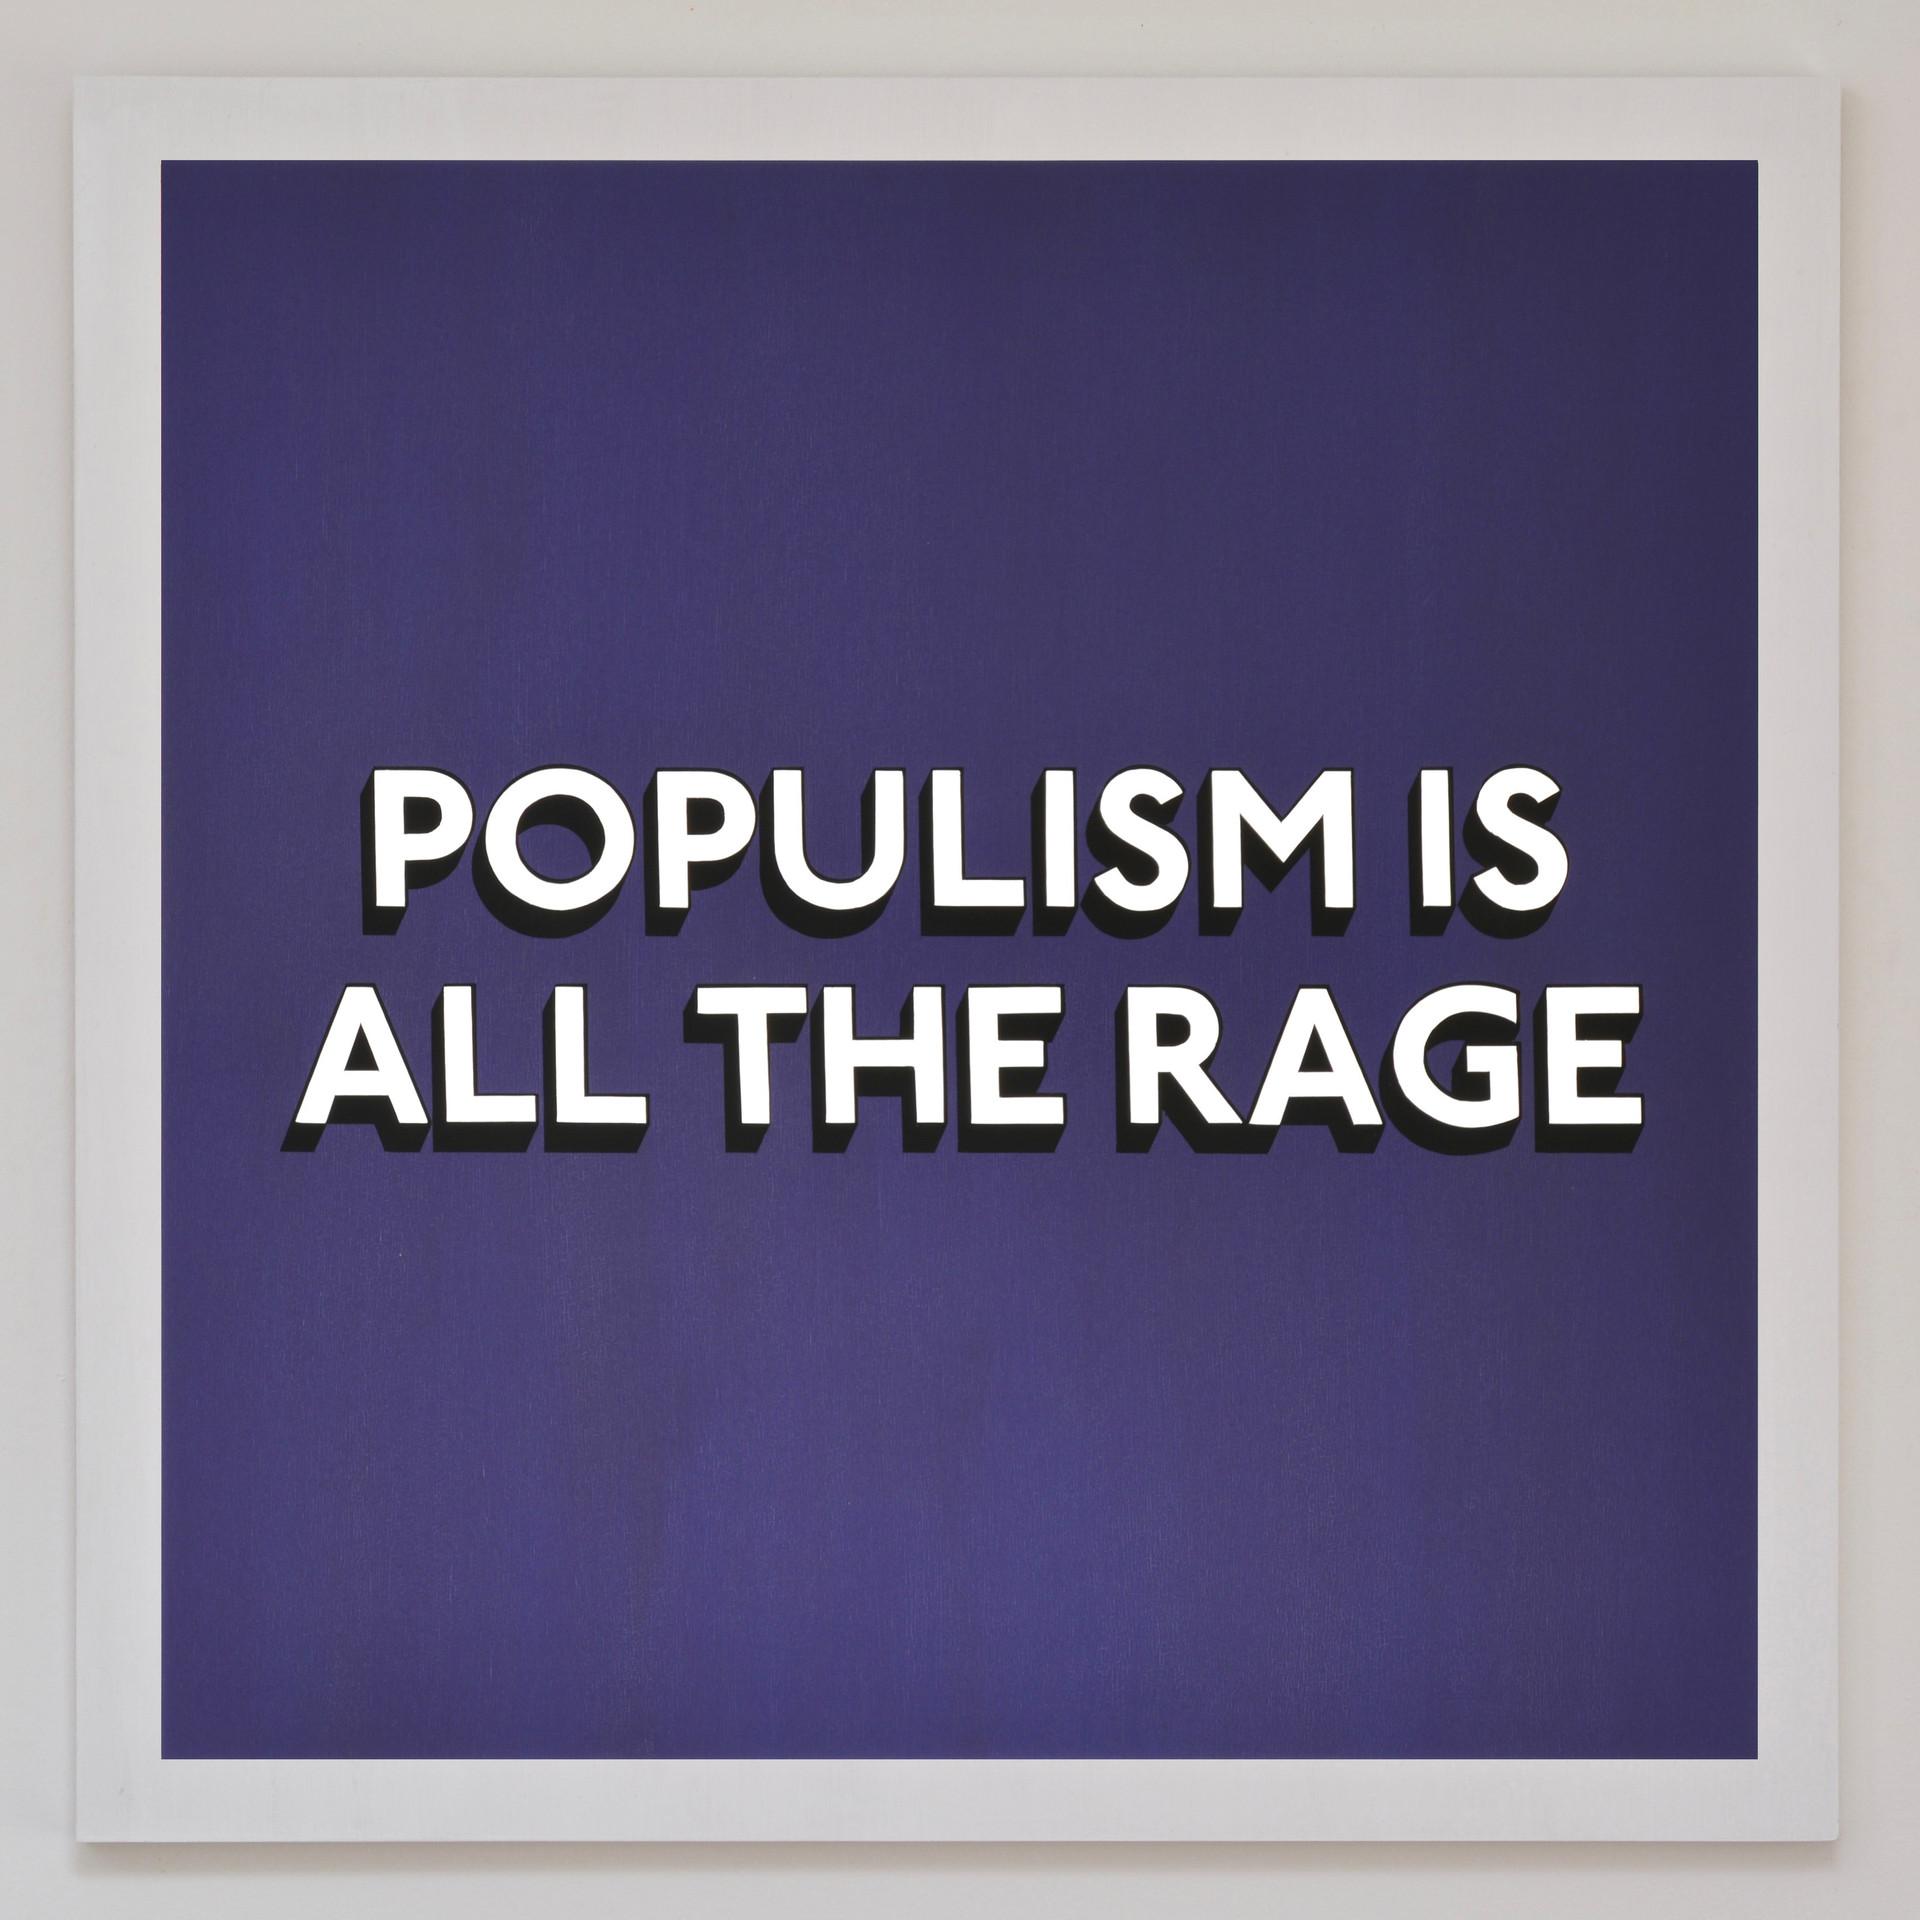 POPULISM_IS_ALL_THE_RAGE.jpg